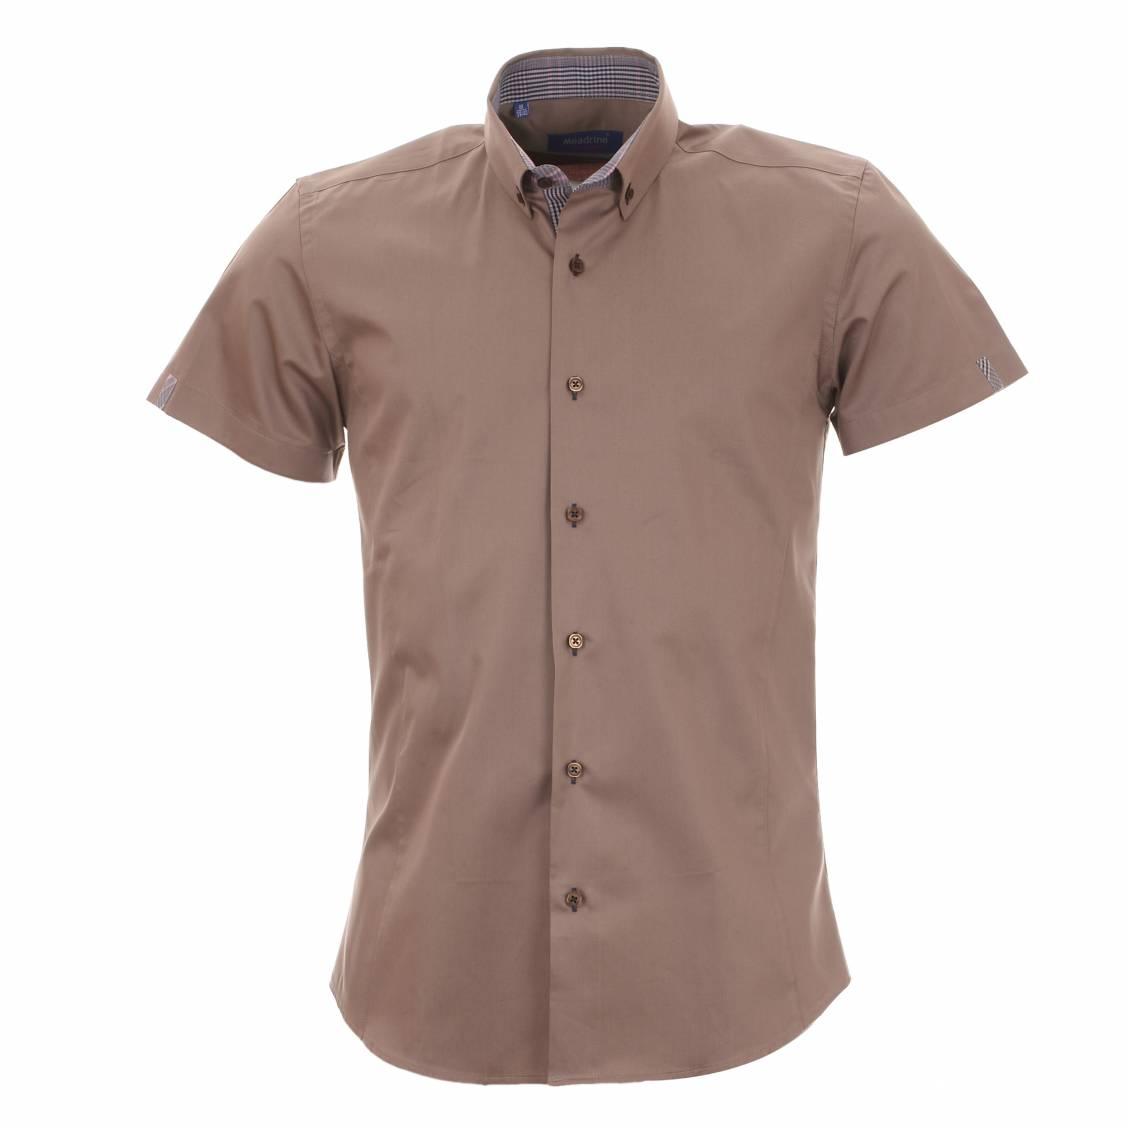 chemise homme manches courtes m adrine marron glac opposition carreaux rue des hommes. Black Bedroom Furniture Sets. Home Design Ideas